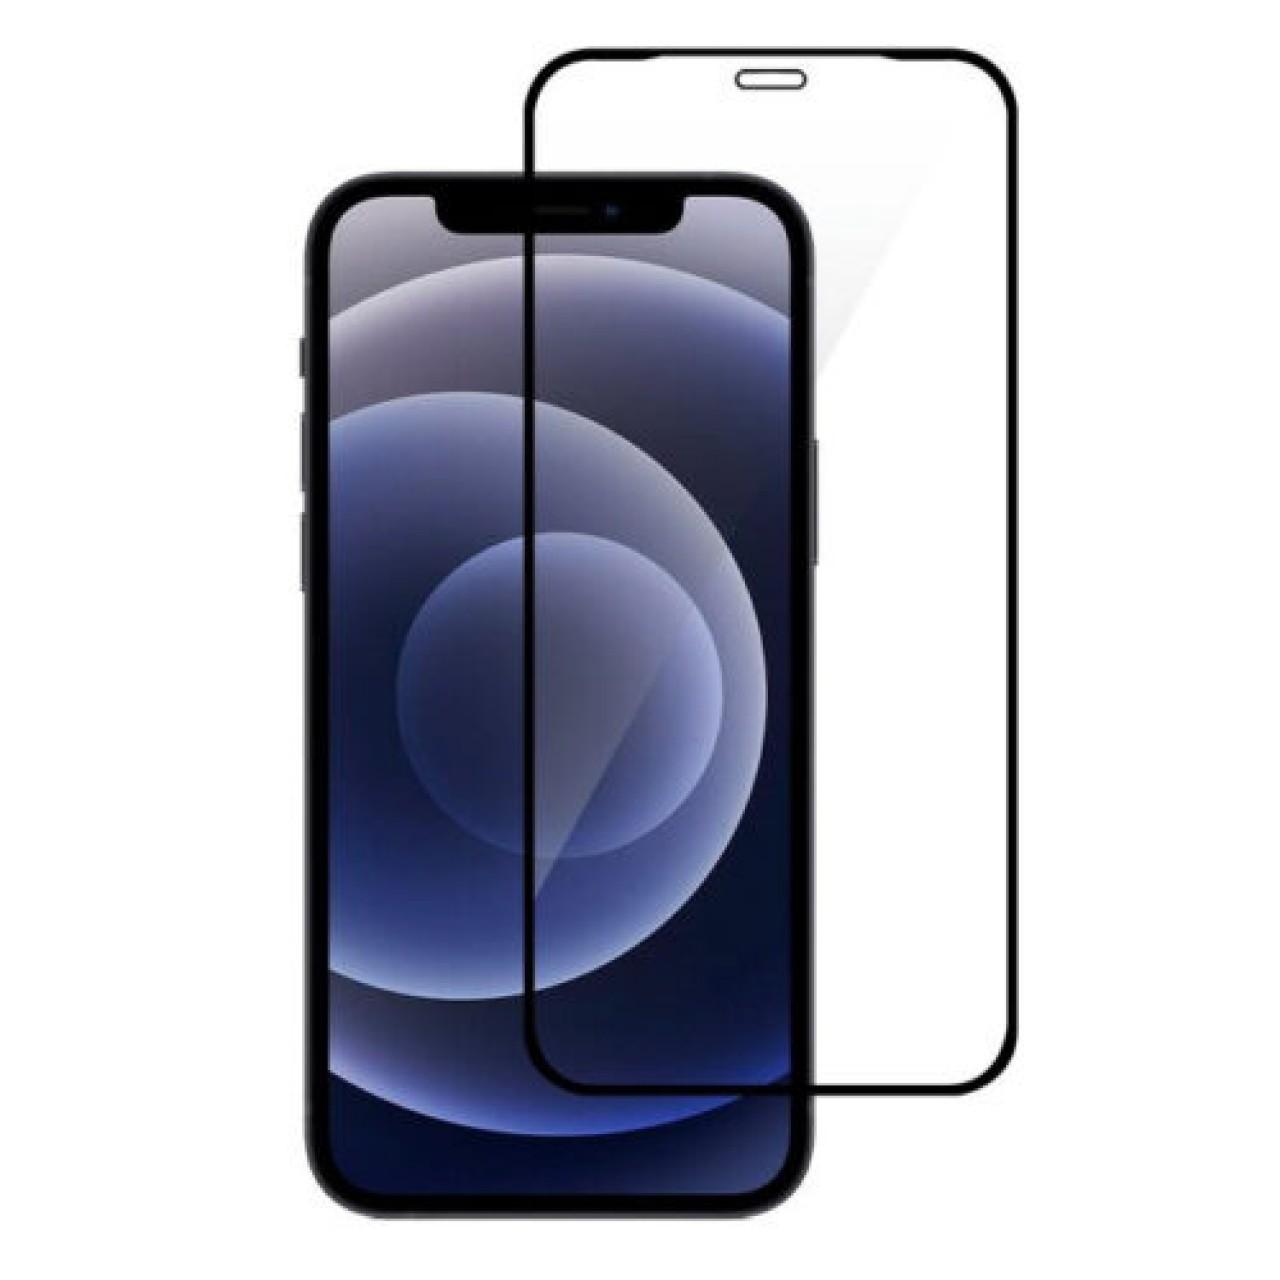 TEMPERED GLASS PREMIUM BLACK  - ΠΡΟΣΤΑΤΕΥΤΙΚΟ ΤΖΑΜΙ ΟΘΟΝΗΣ ΓΙΑ iPhone 12 / 12 Pro - ΜΑΥΡΟ